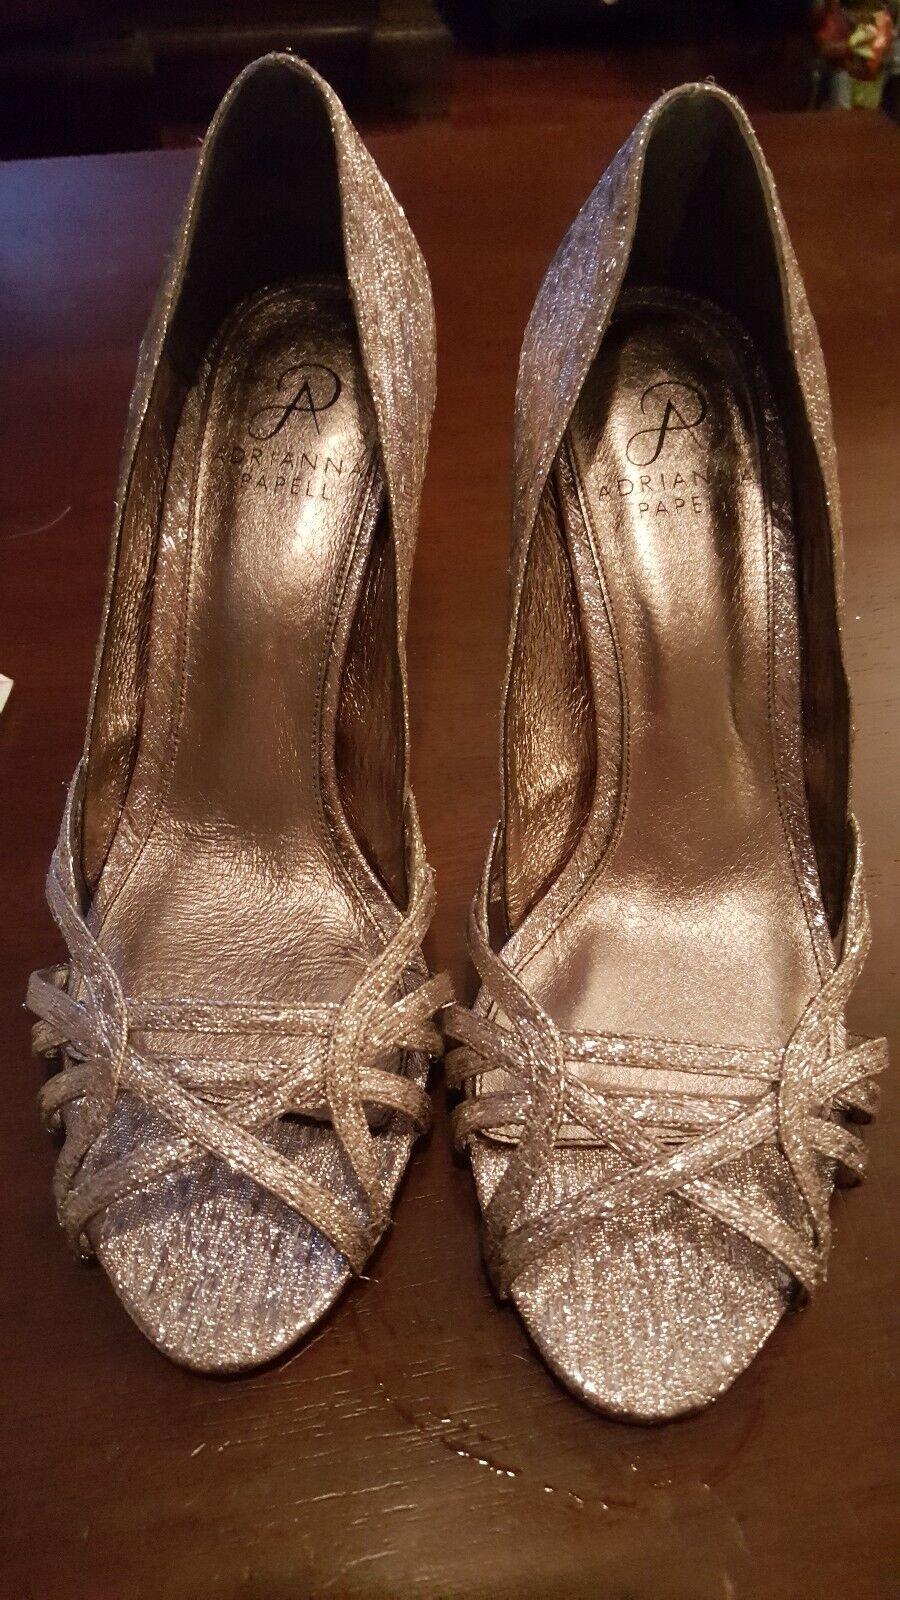 Adrianna Papell Gunmetal Silber Slip on Heels 3.5  Heel Größe 8M NWOB